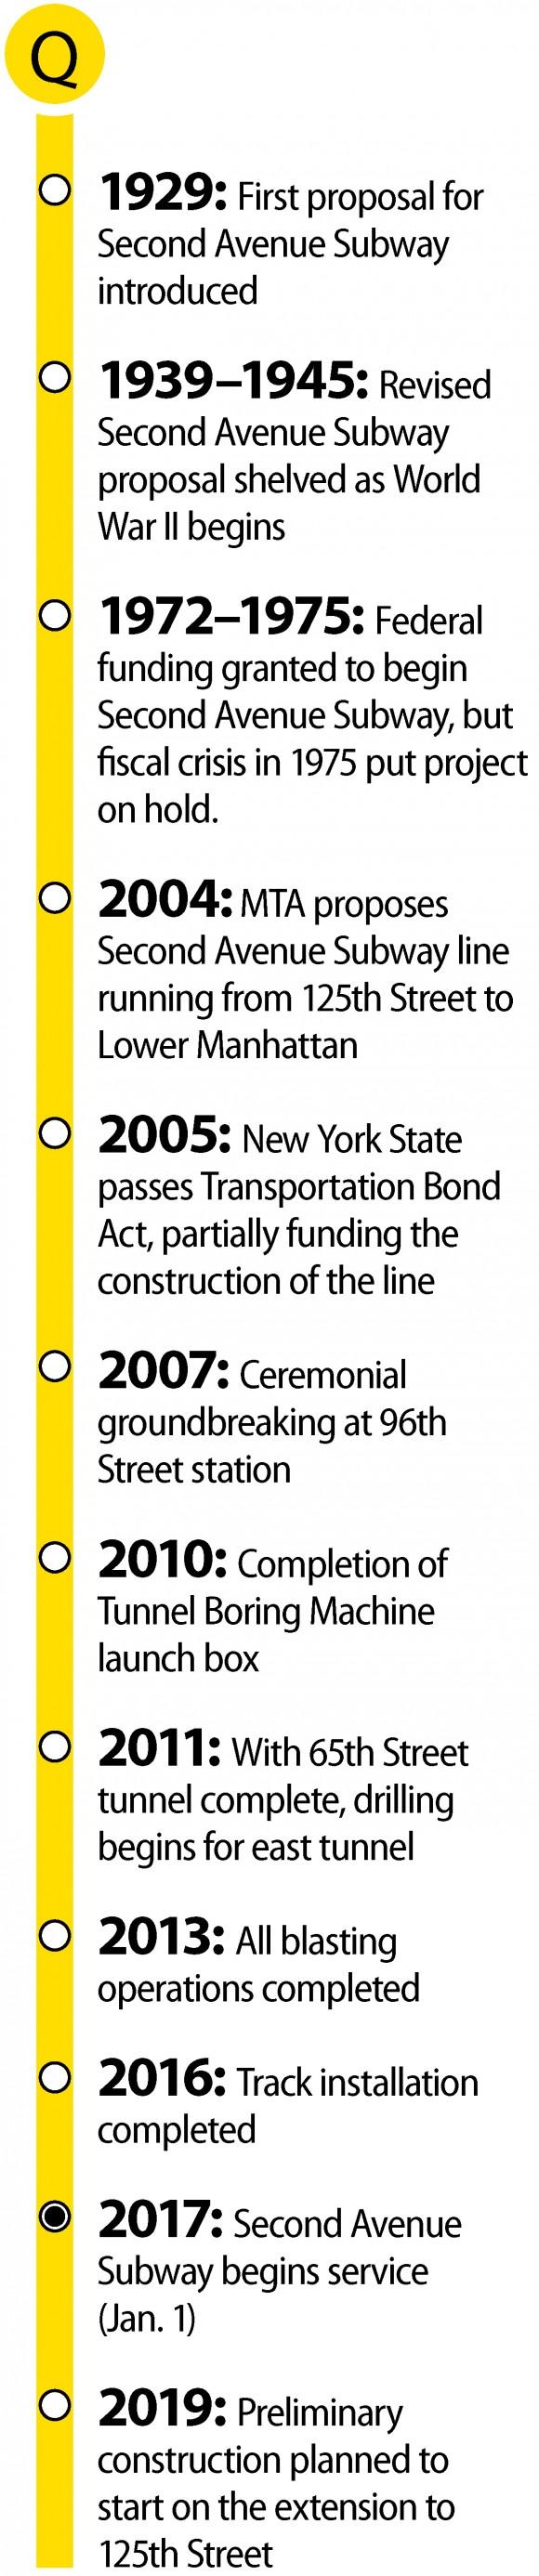 (SOURCE: Metropolitan Transit Authority)